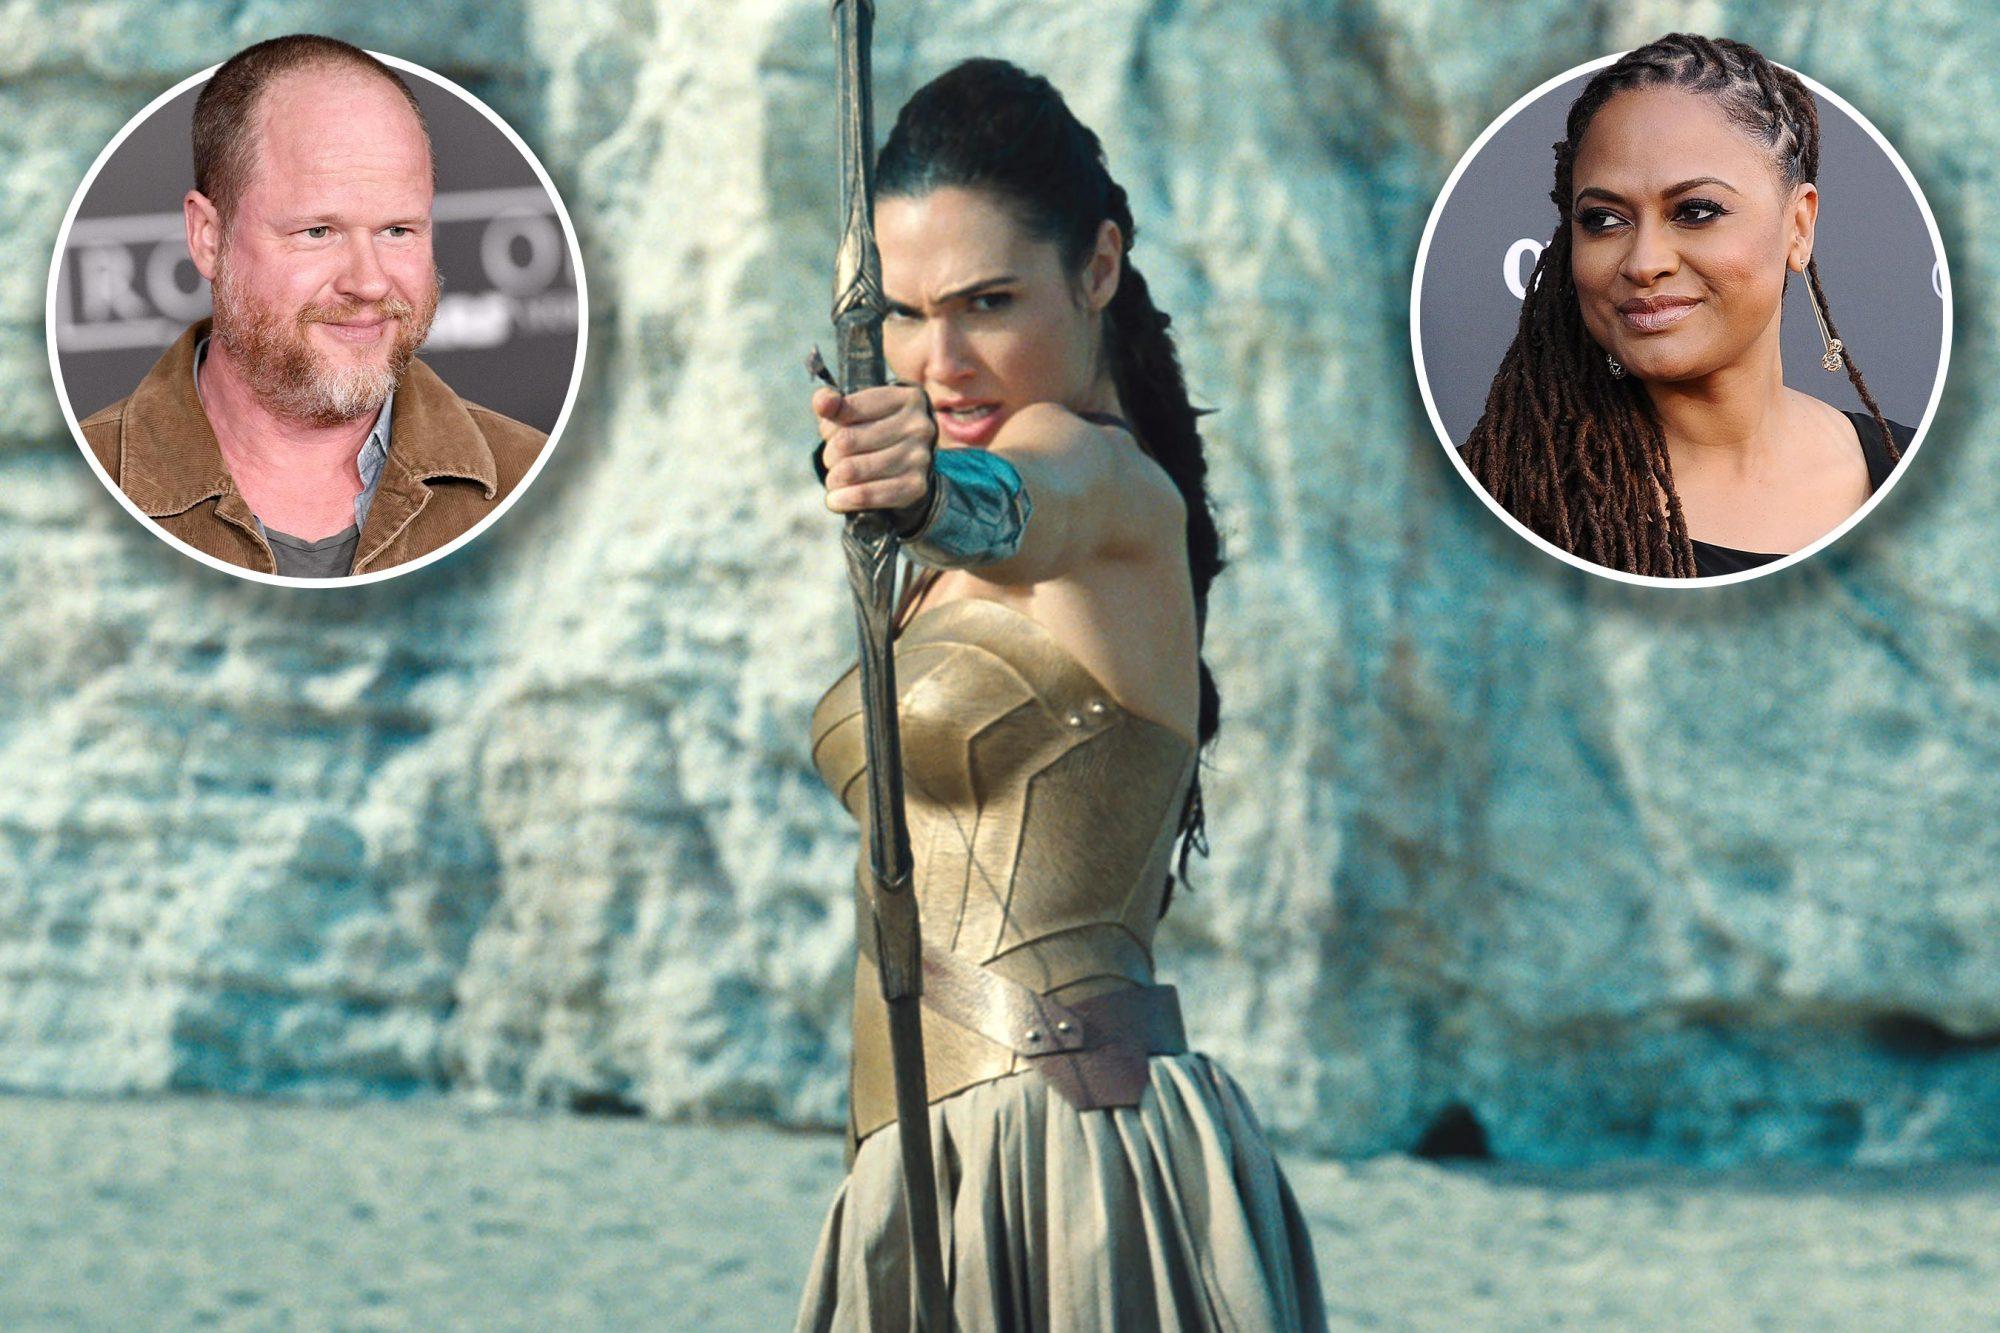 Wonder-Woman-Joss-Whedon-Ava-DuVernay